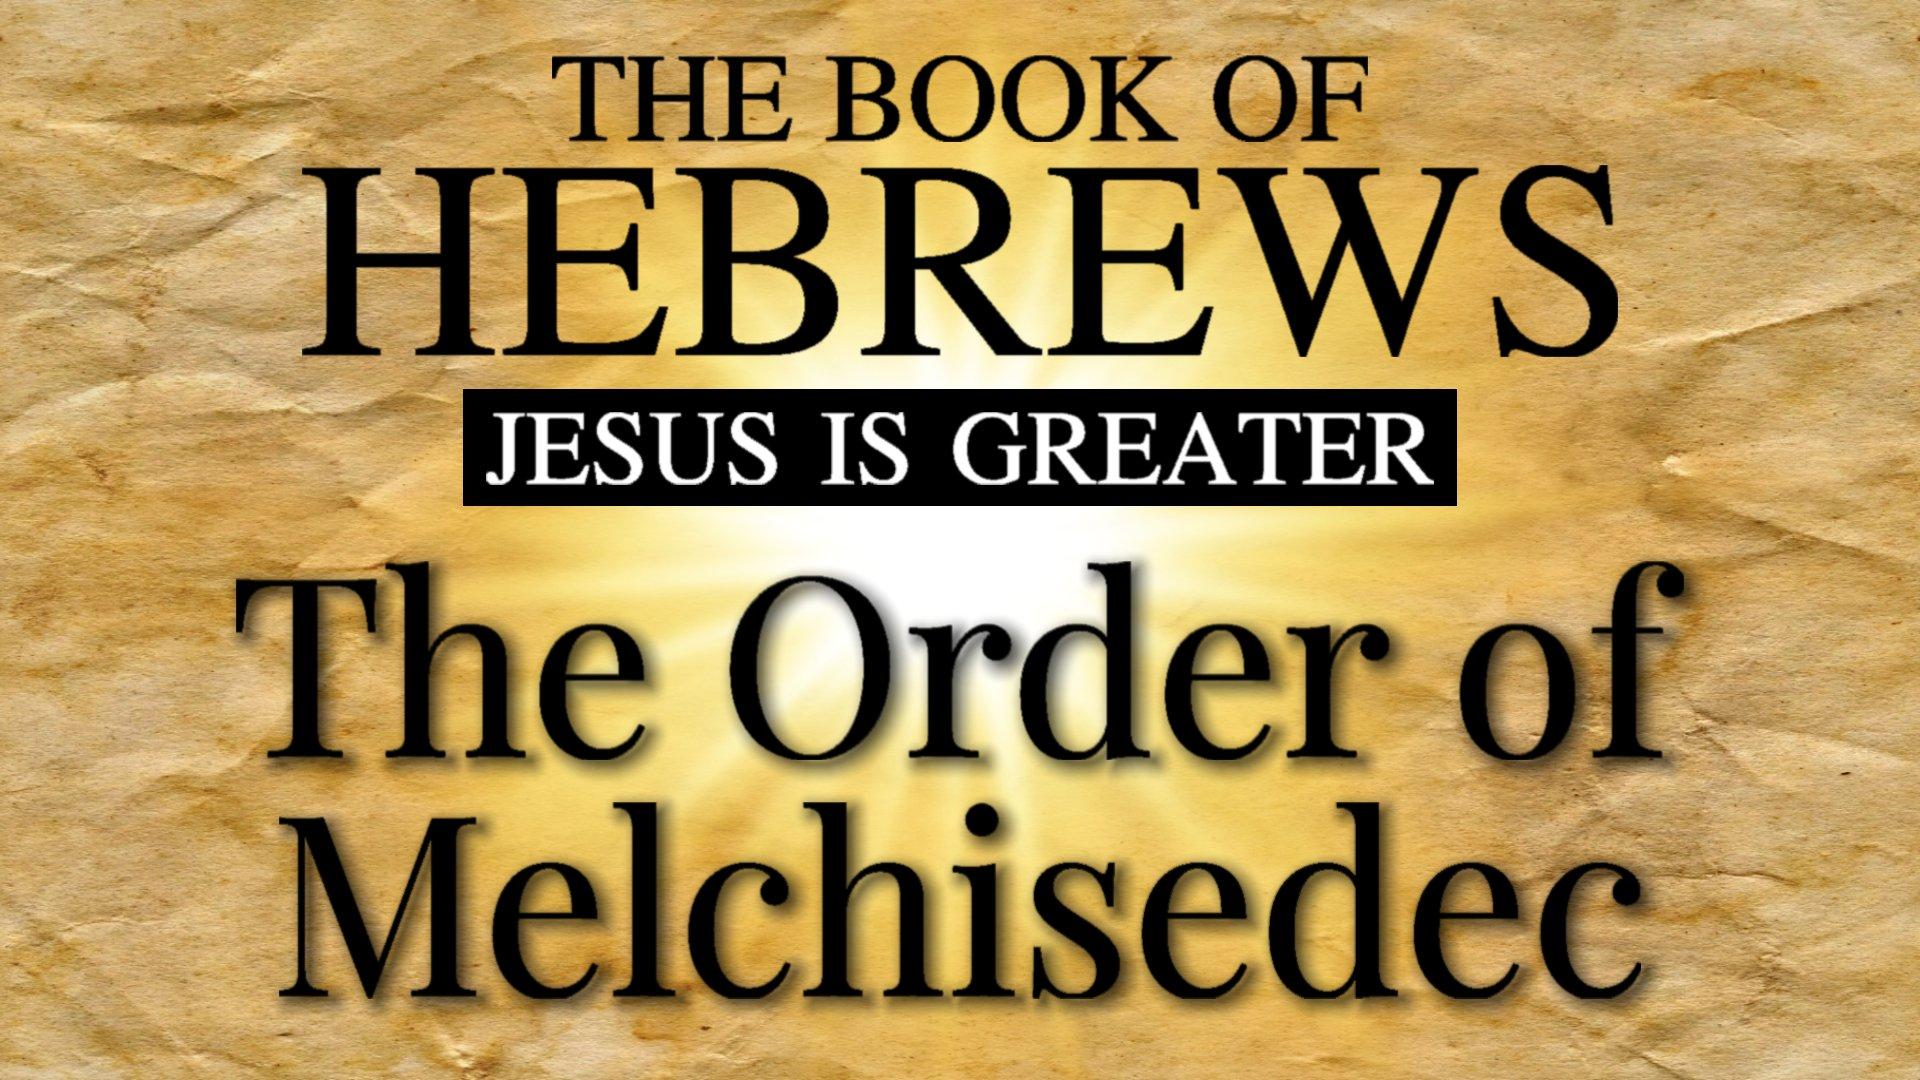 11 The Order of Melchisedec